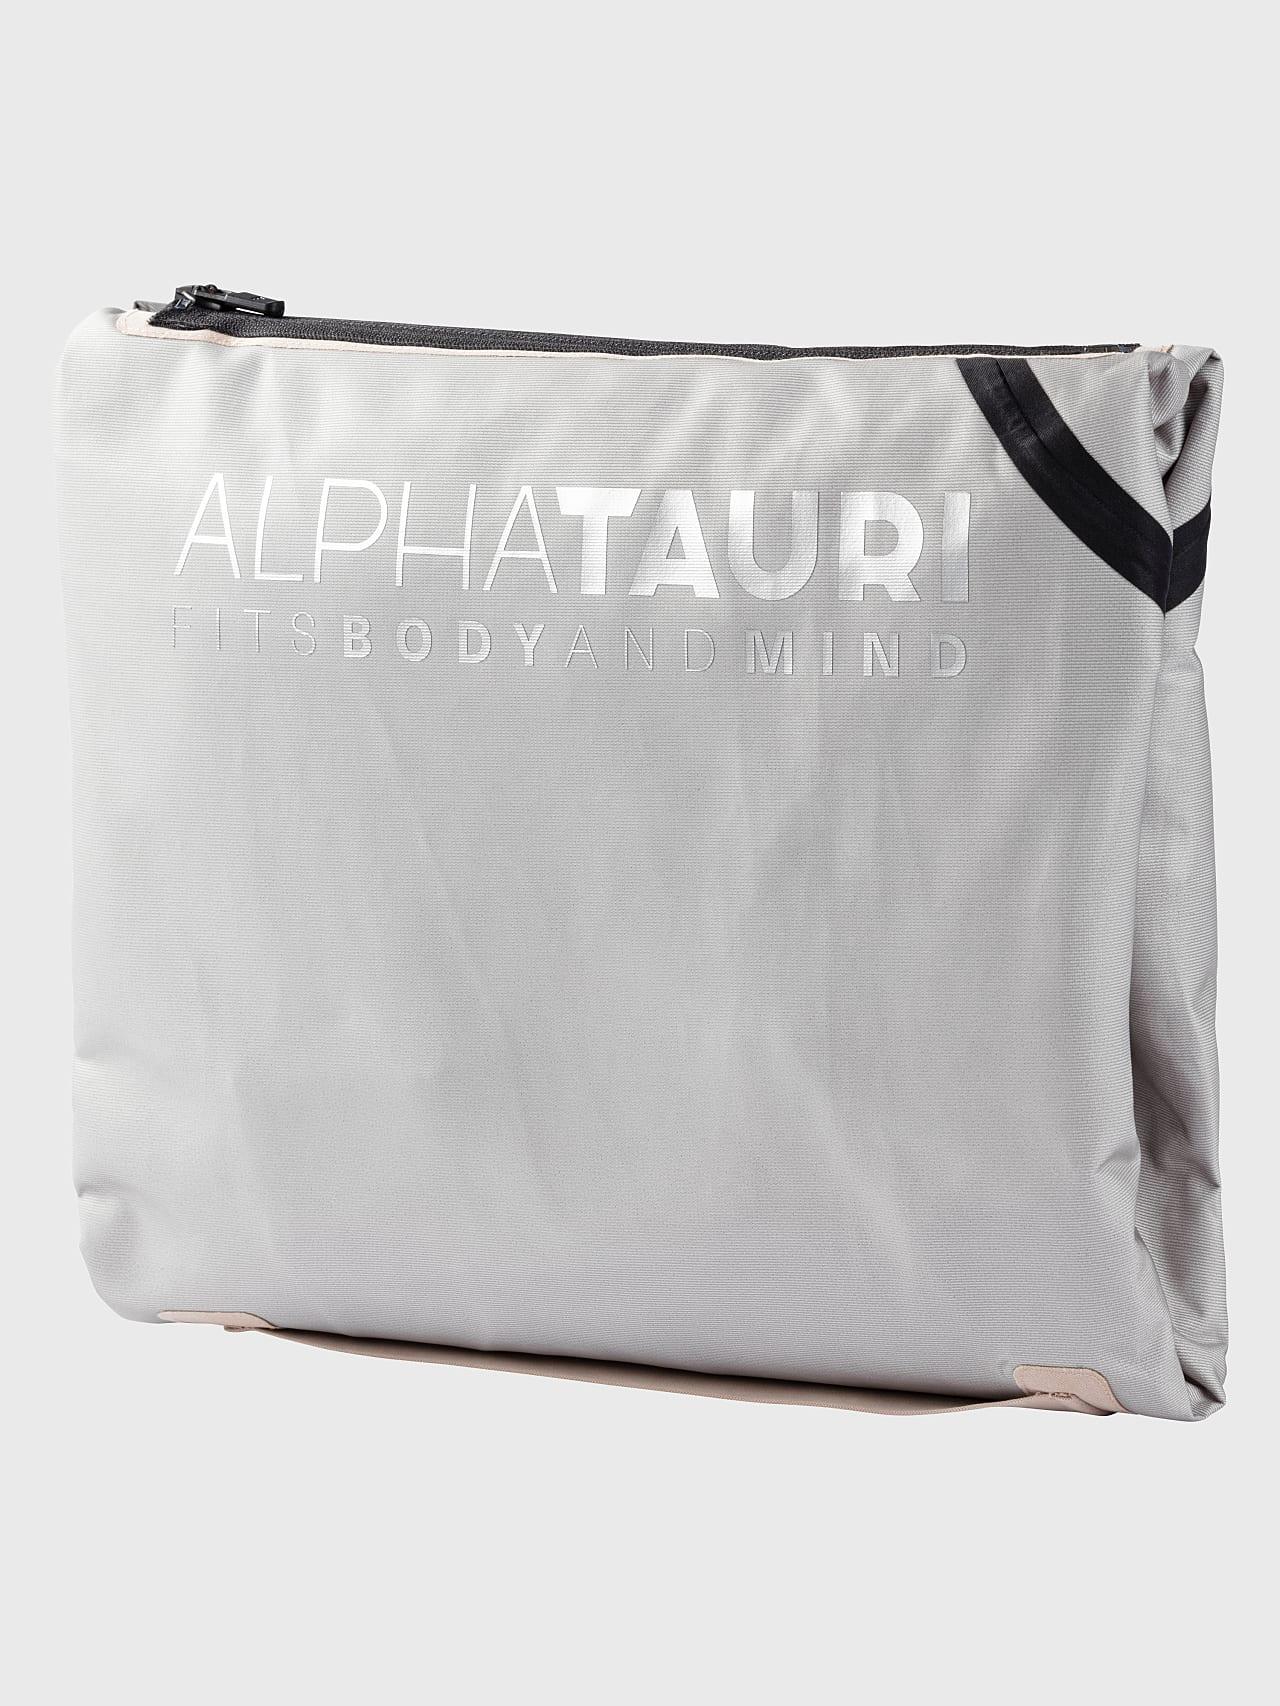 OKOVO V3.Y5.01 Packable Waterproof Jacket Sand scene7.view.8.name Alpha Tauri